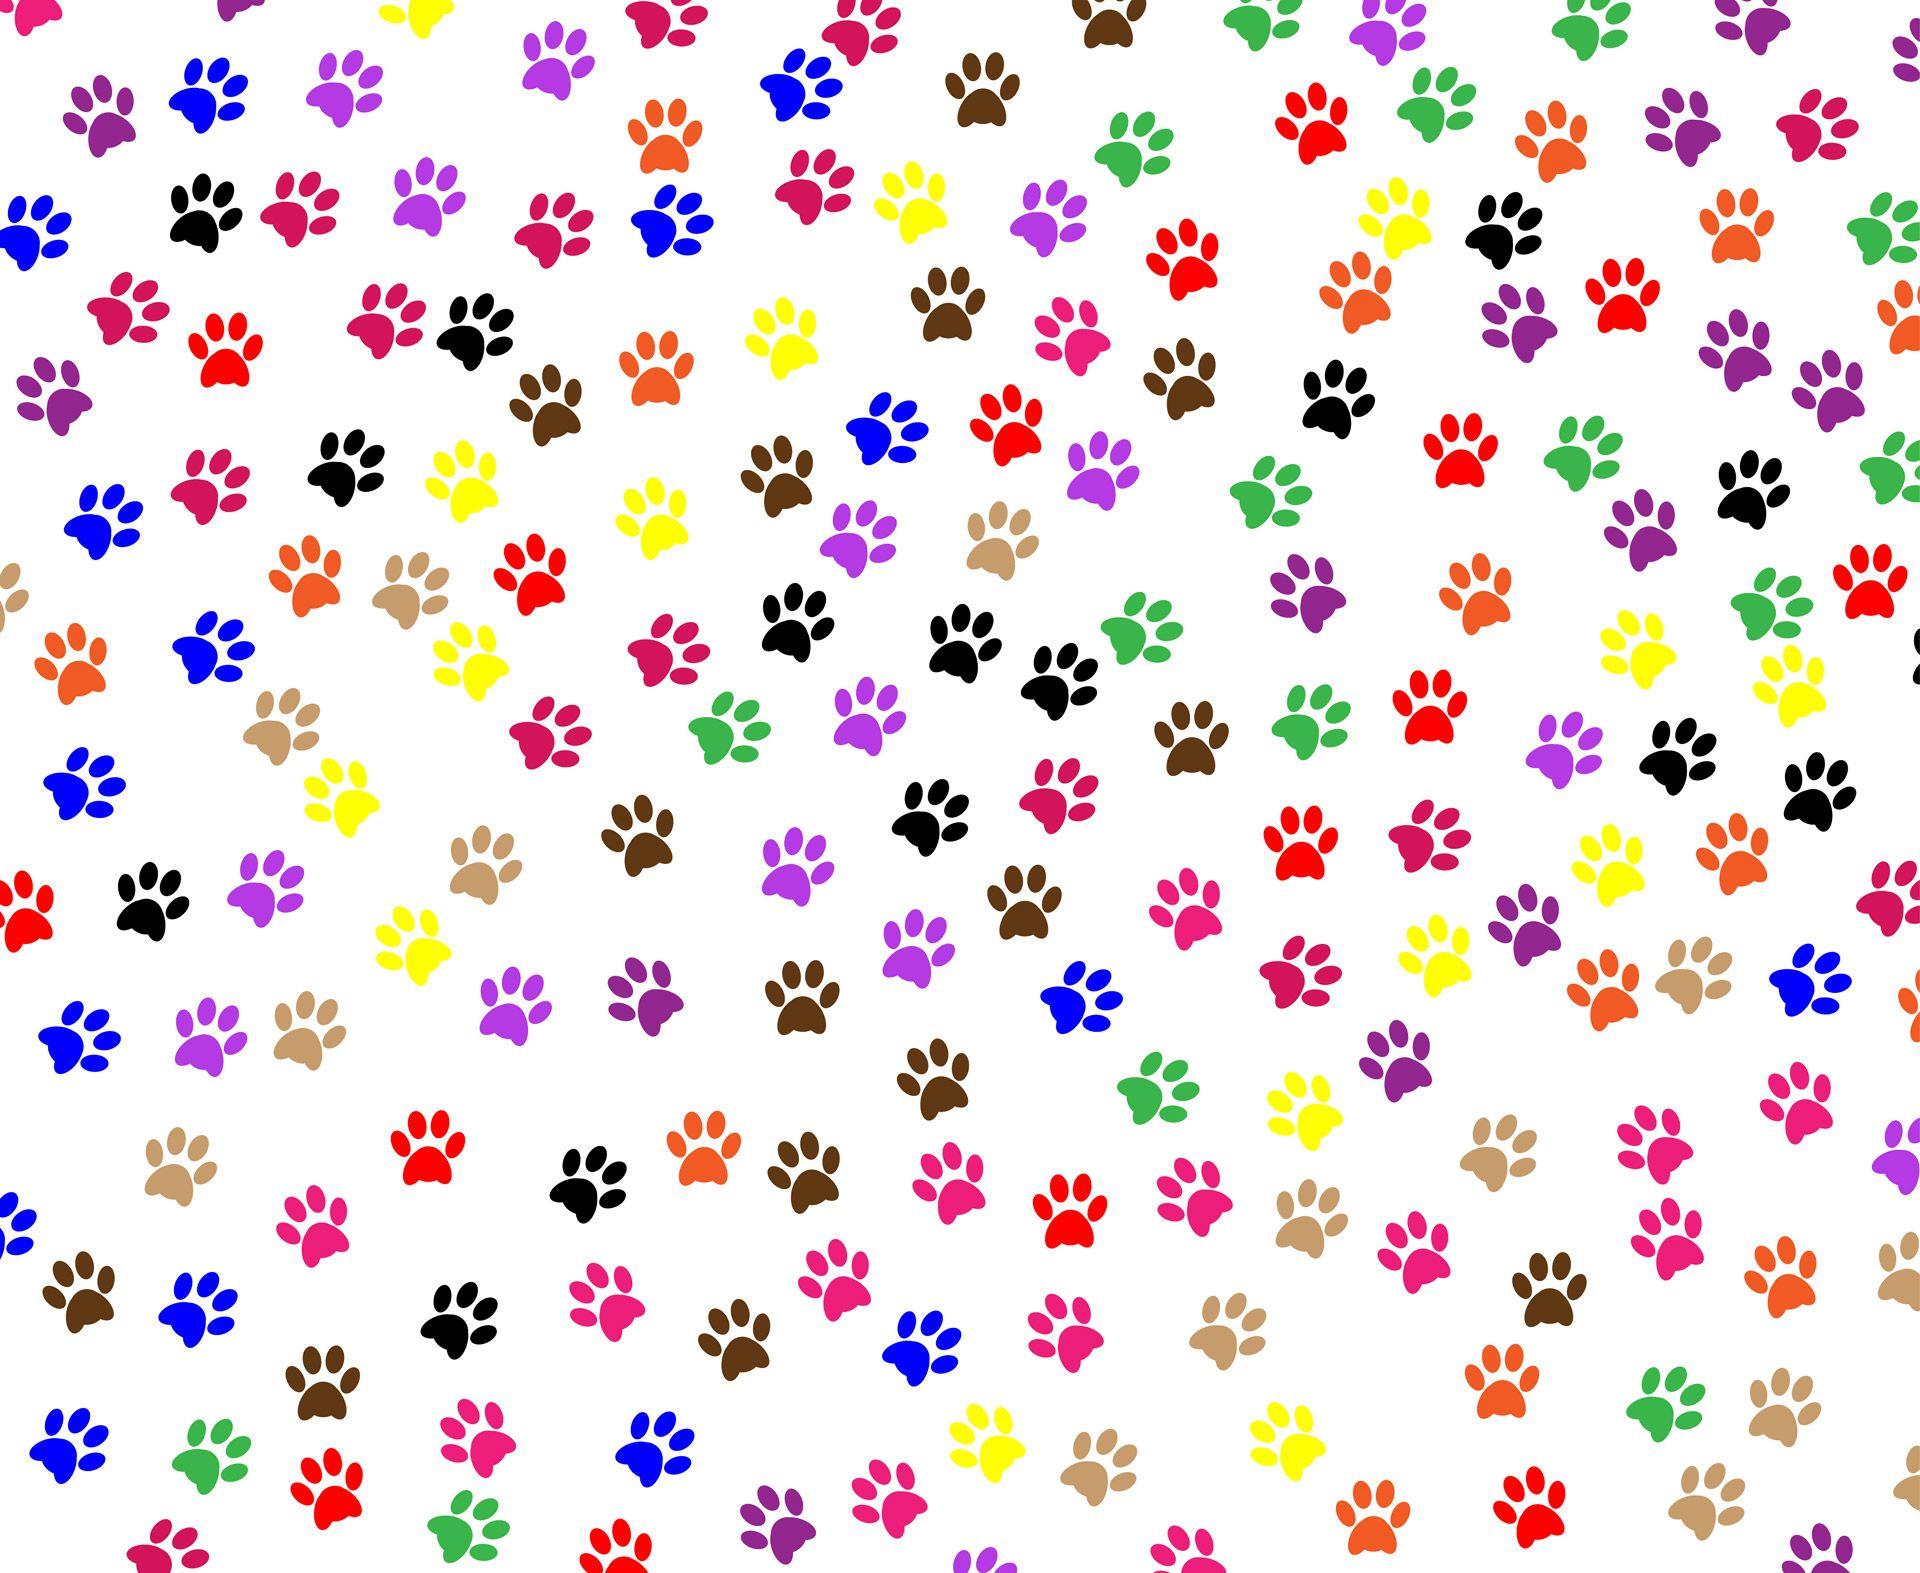 Paw prints background free stock photo hd public domain - Dog print wallpaper ...